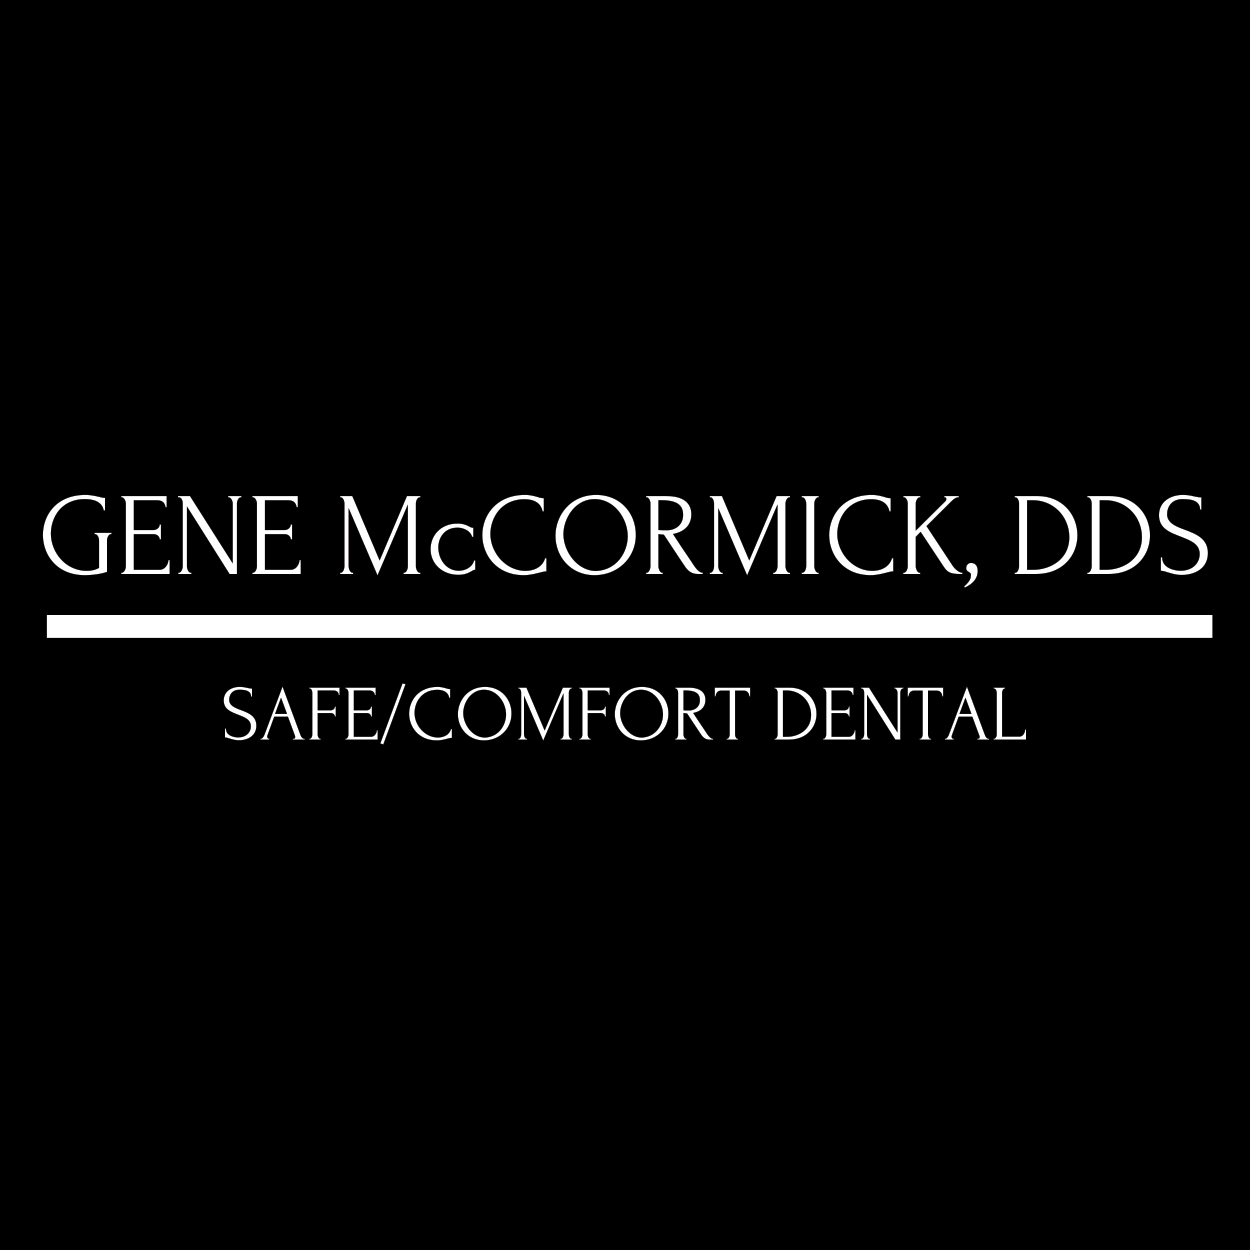 Gene McCormick DDS